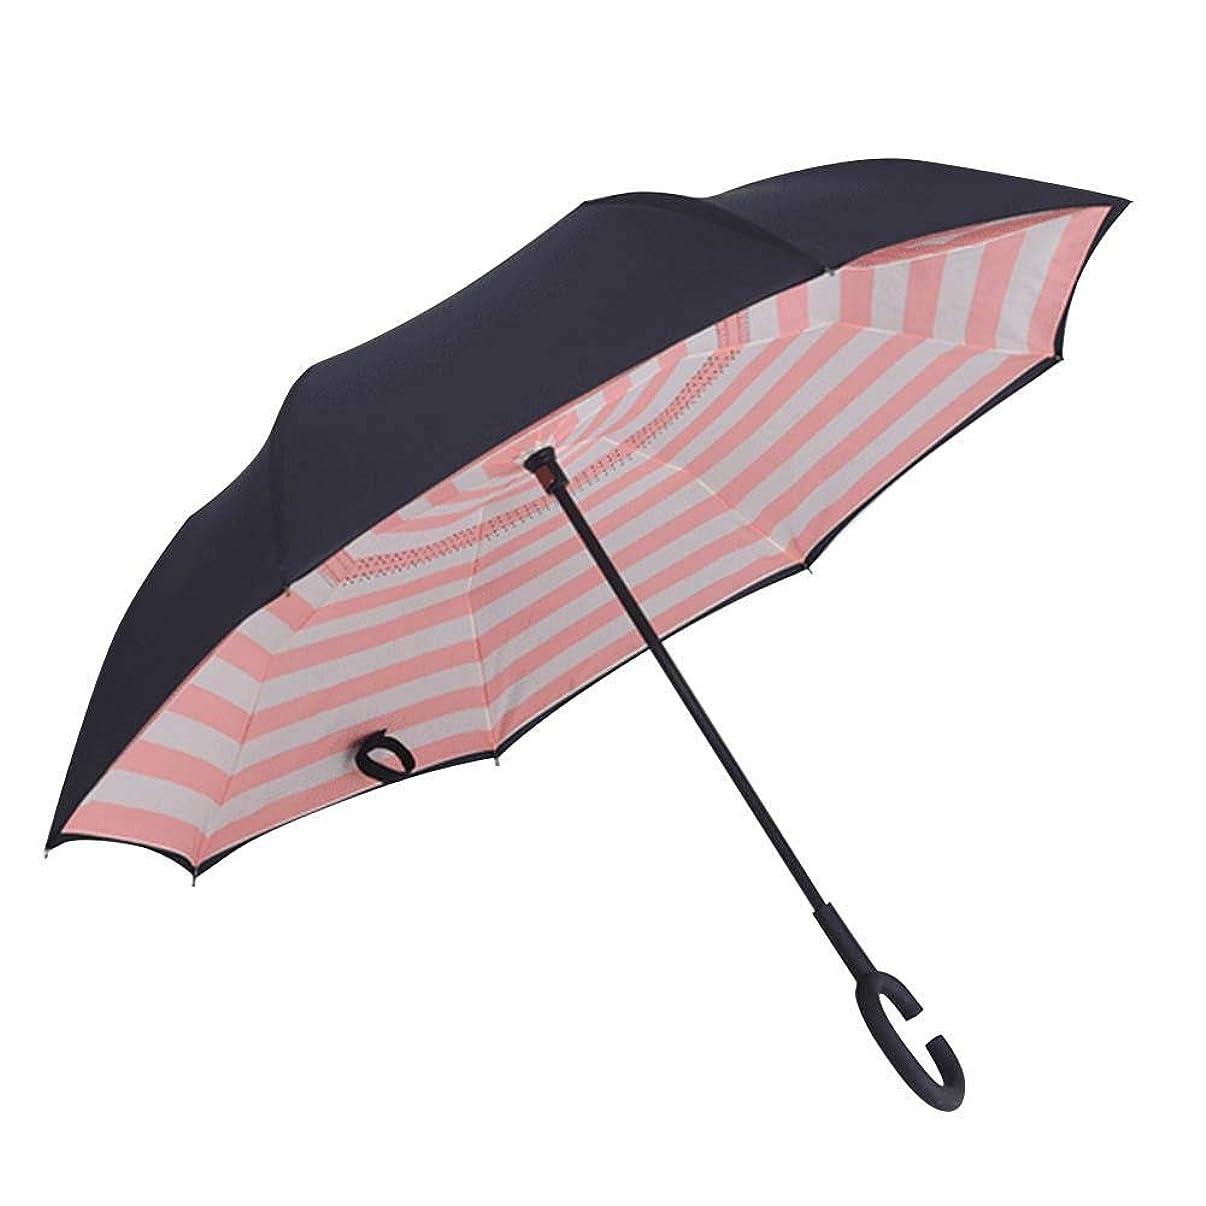 TOMOYOU Double Layer Inverted Umbrella C Shape Handle Reverse Folding Umbrella Anti-UV Windproof Travel Umbrella with Carrying Bag Waterproof Straight Umbrella Reverse Umbrella